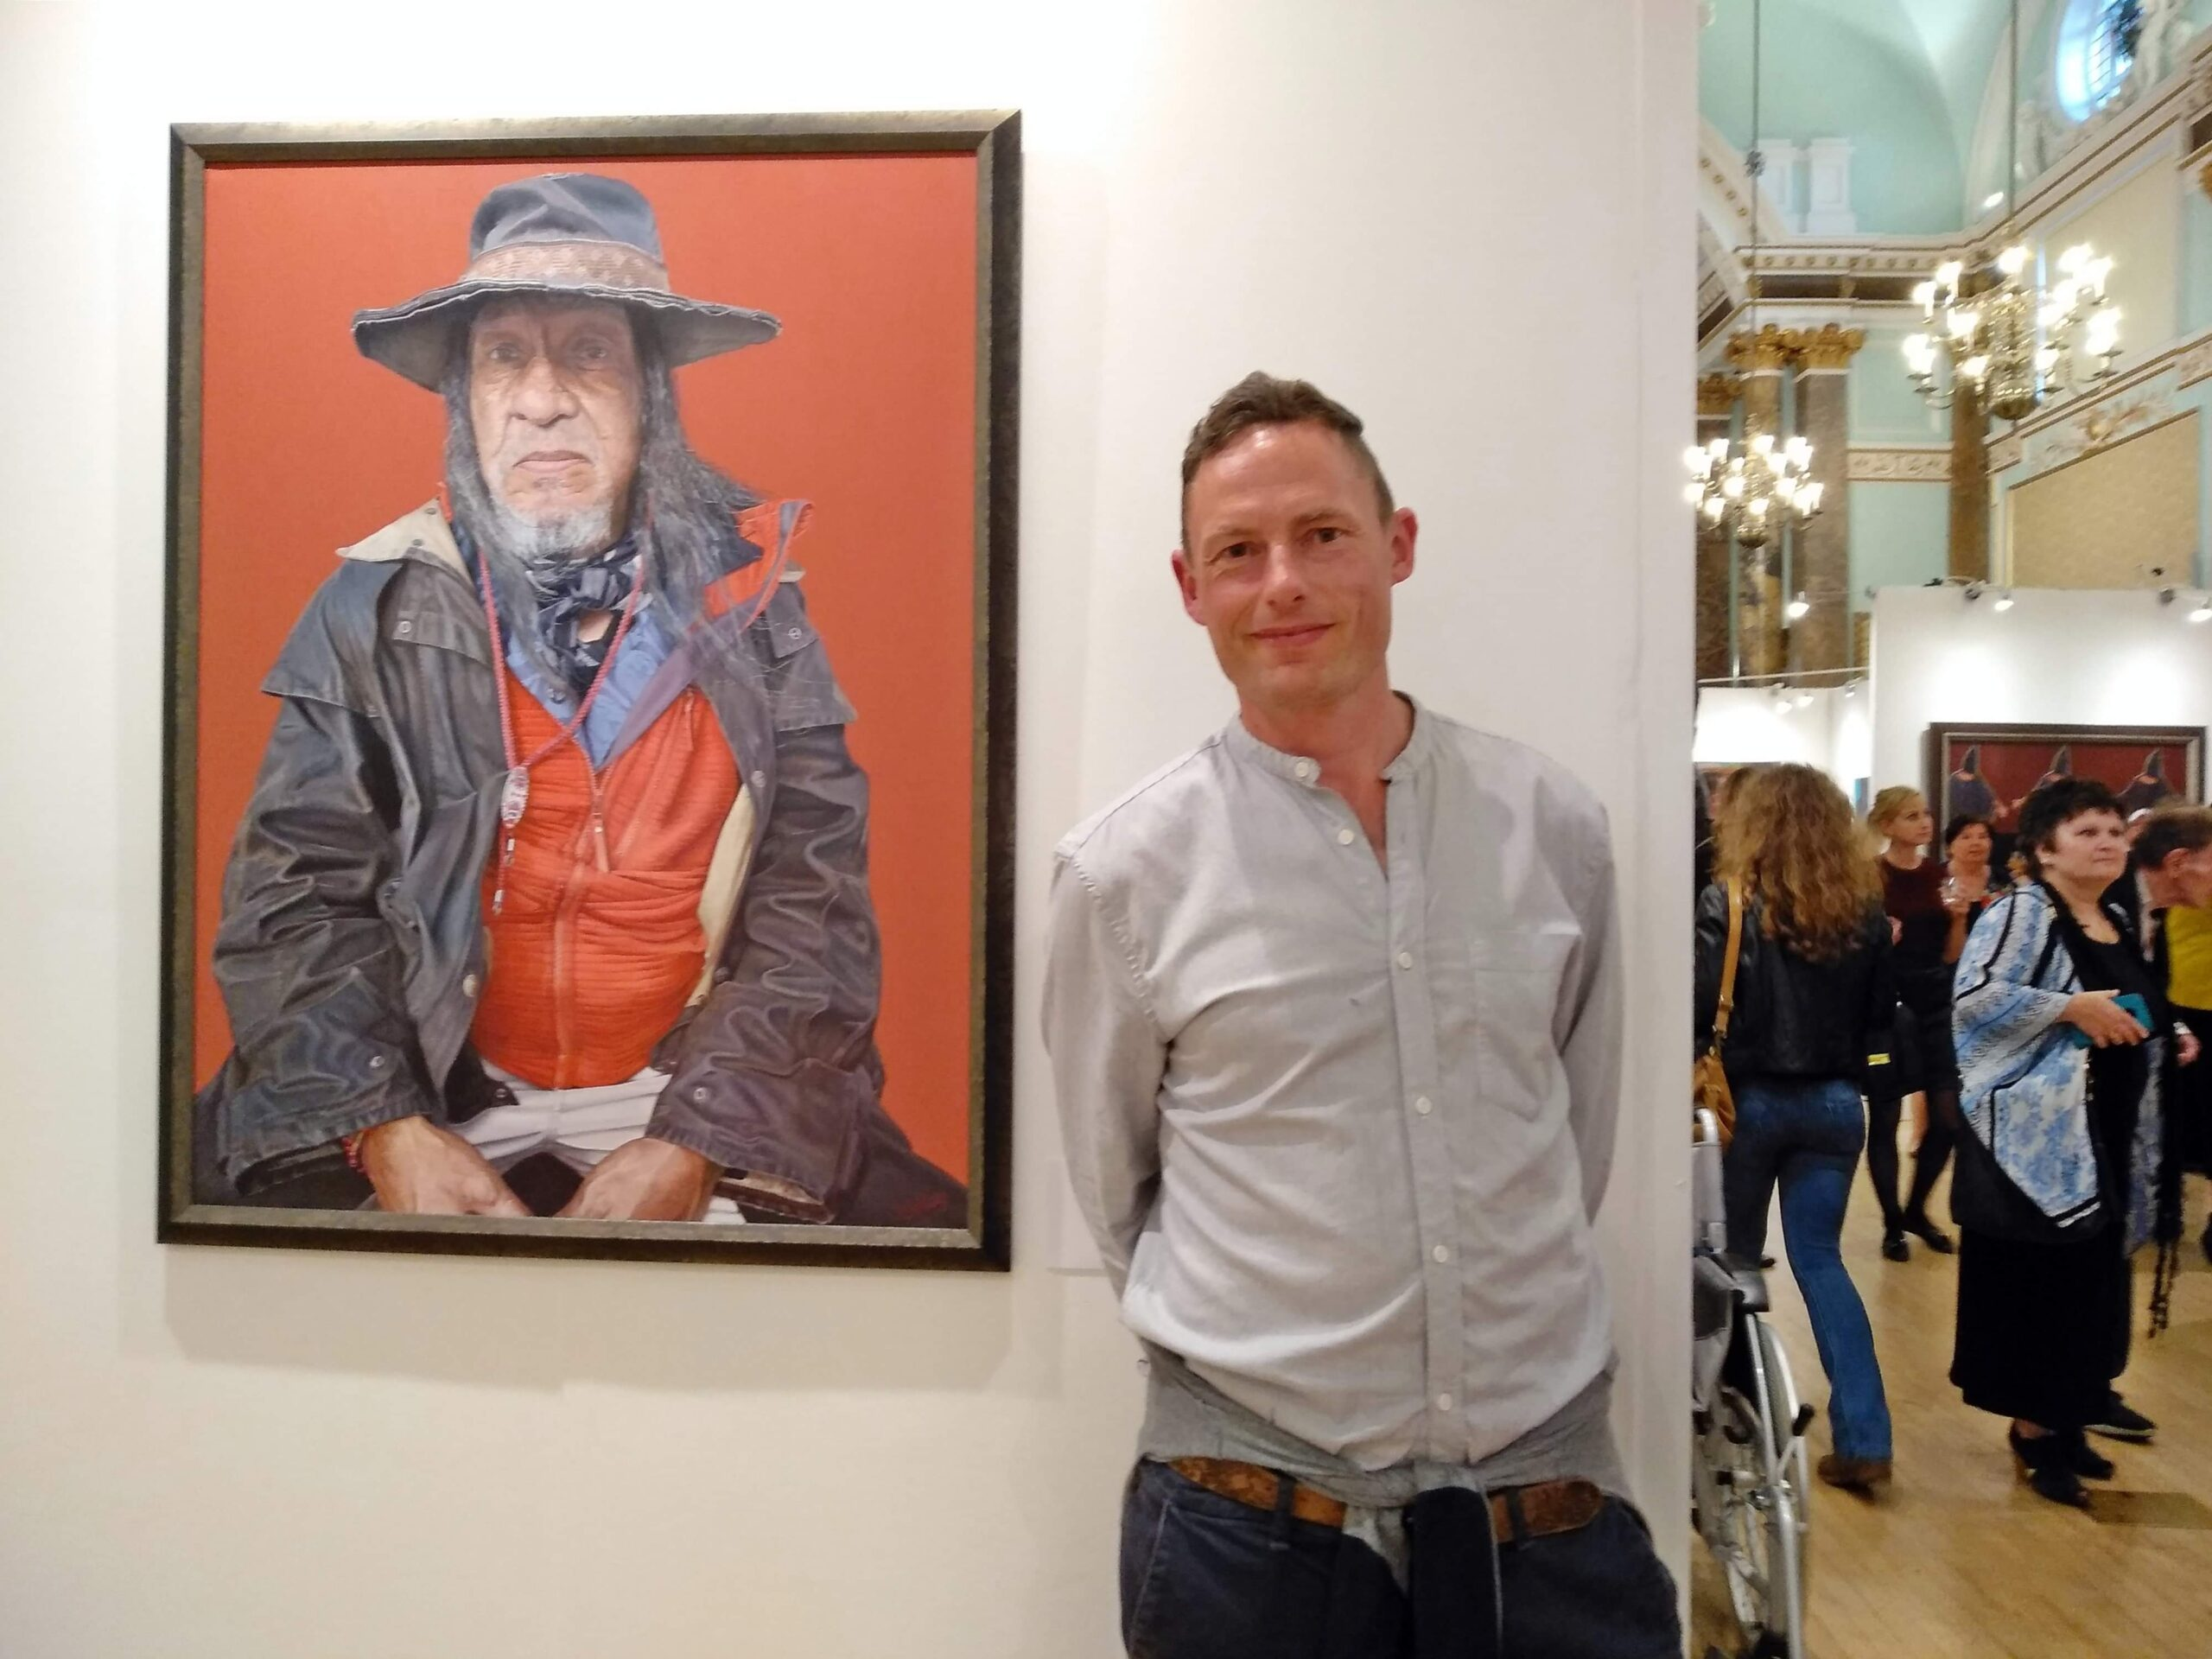 James Earley Artist Portraits gallery london biennale 2019